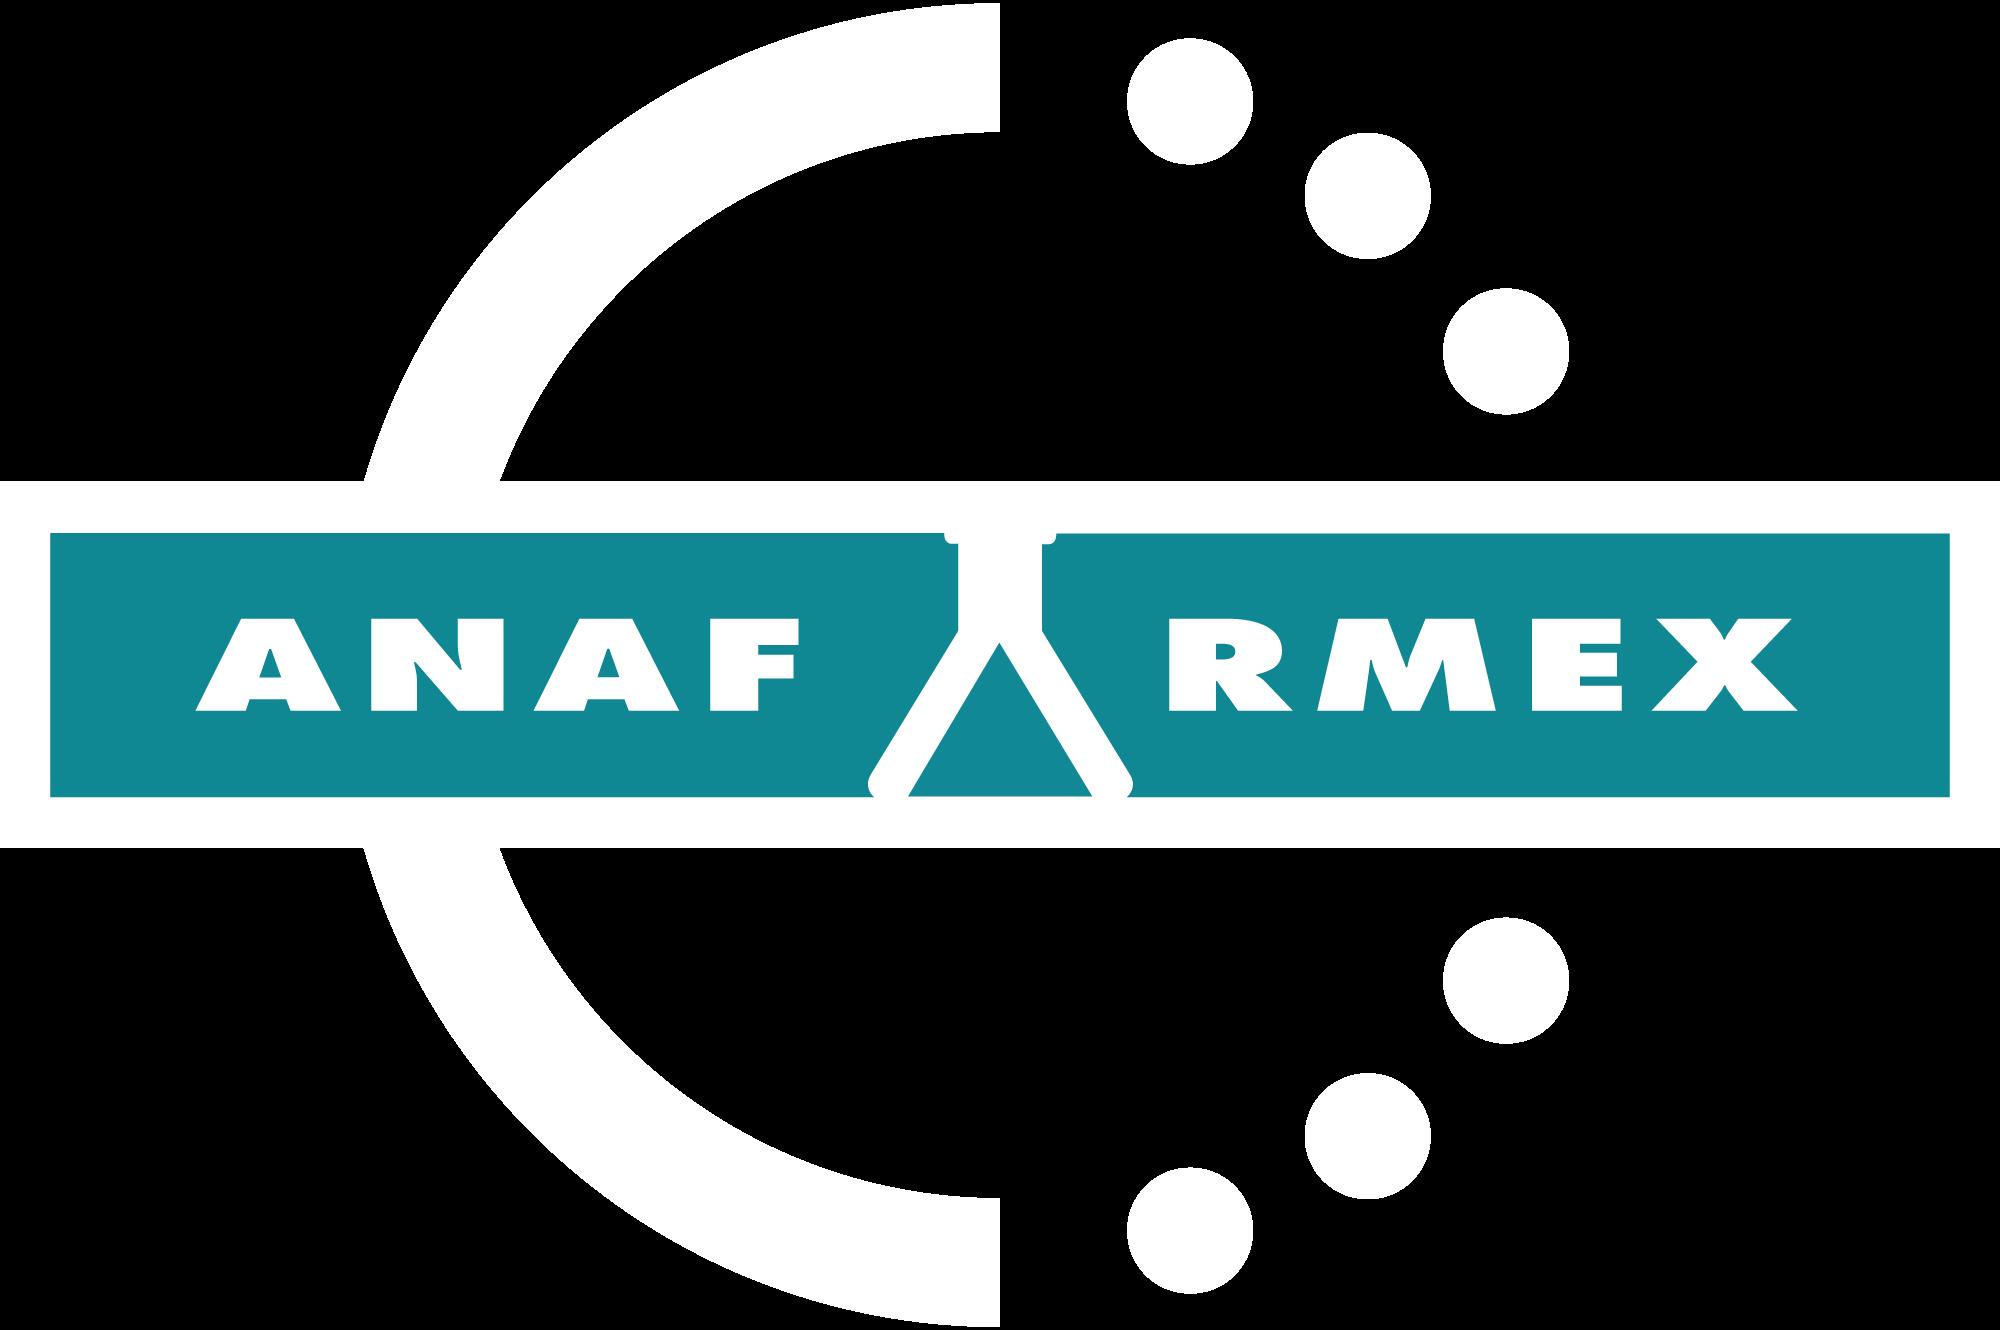 anafarmex-logo